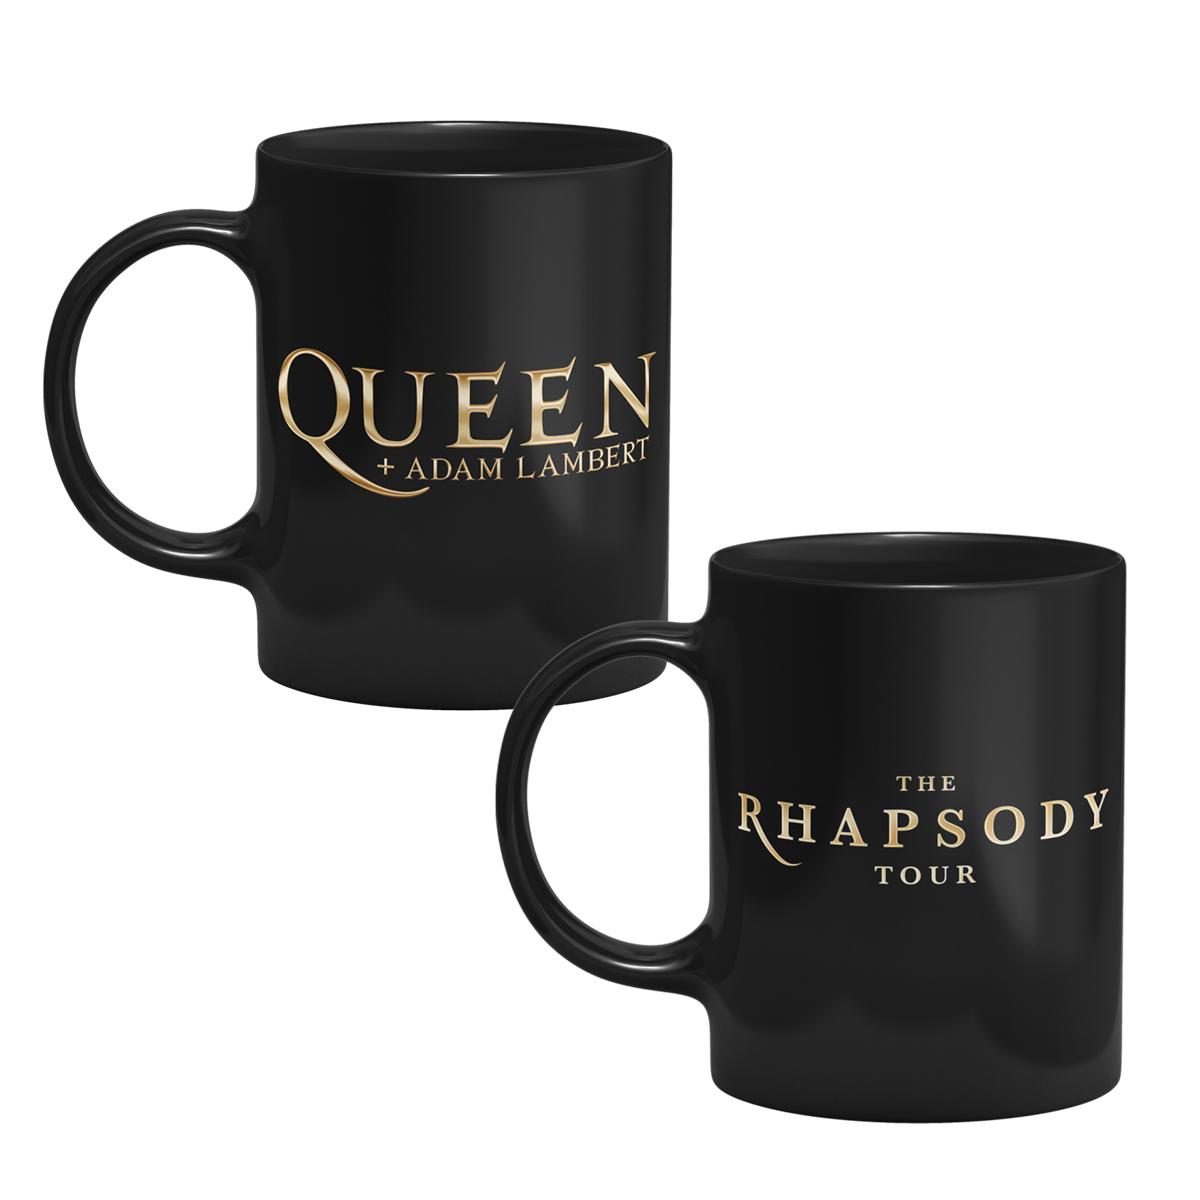 Rhapsody Tour Black Mug